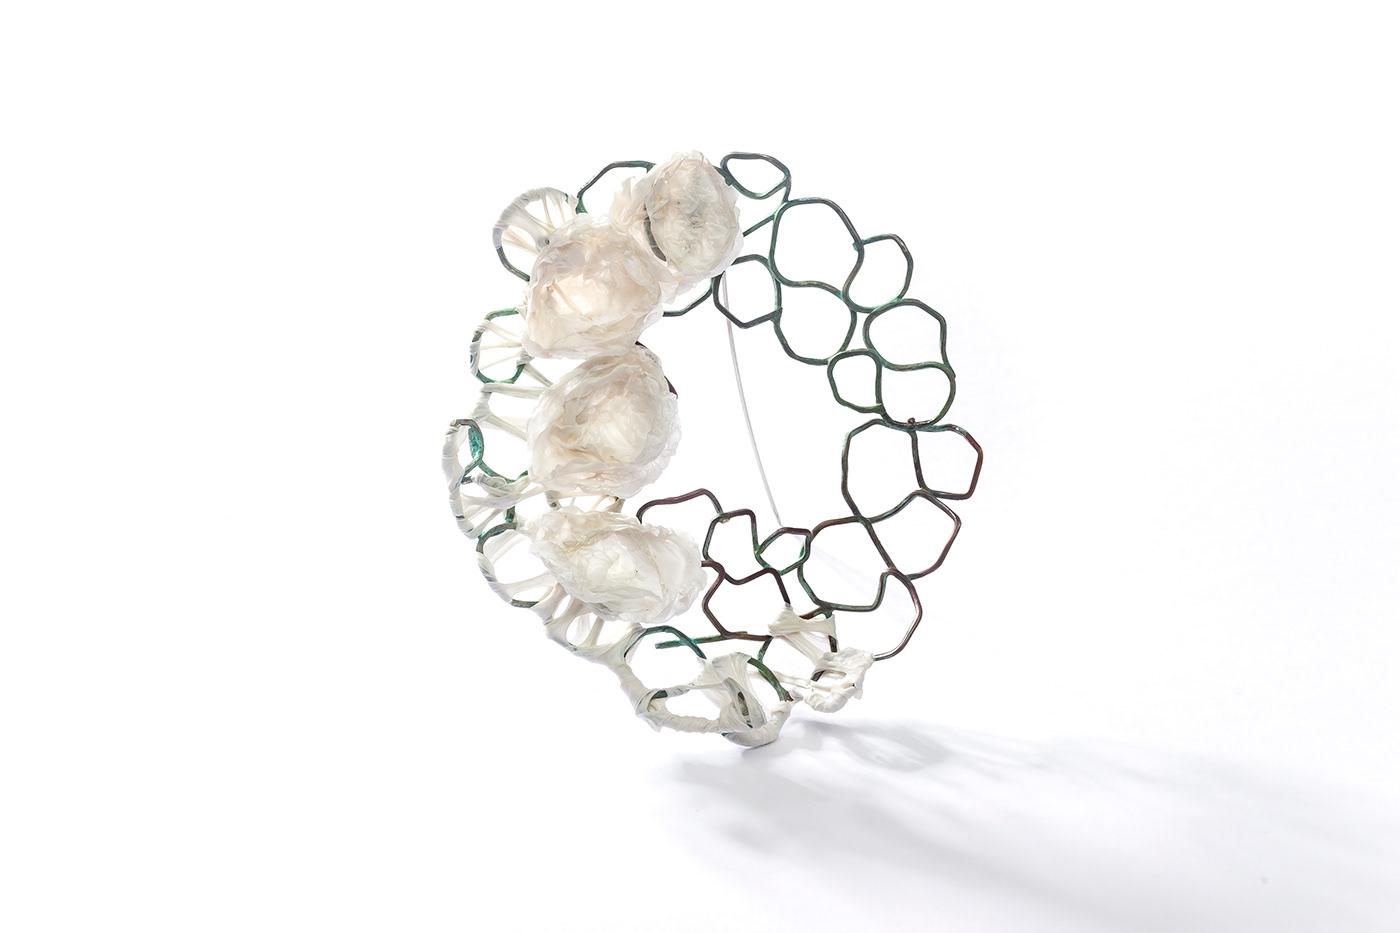 contemporary jewelery  contemporary jewelry joyeria Joyería contemporánea mabel pena plastic